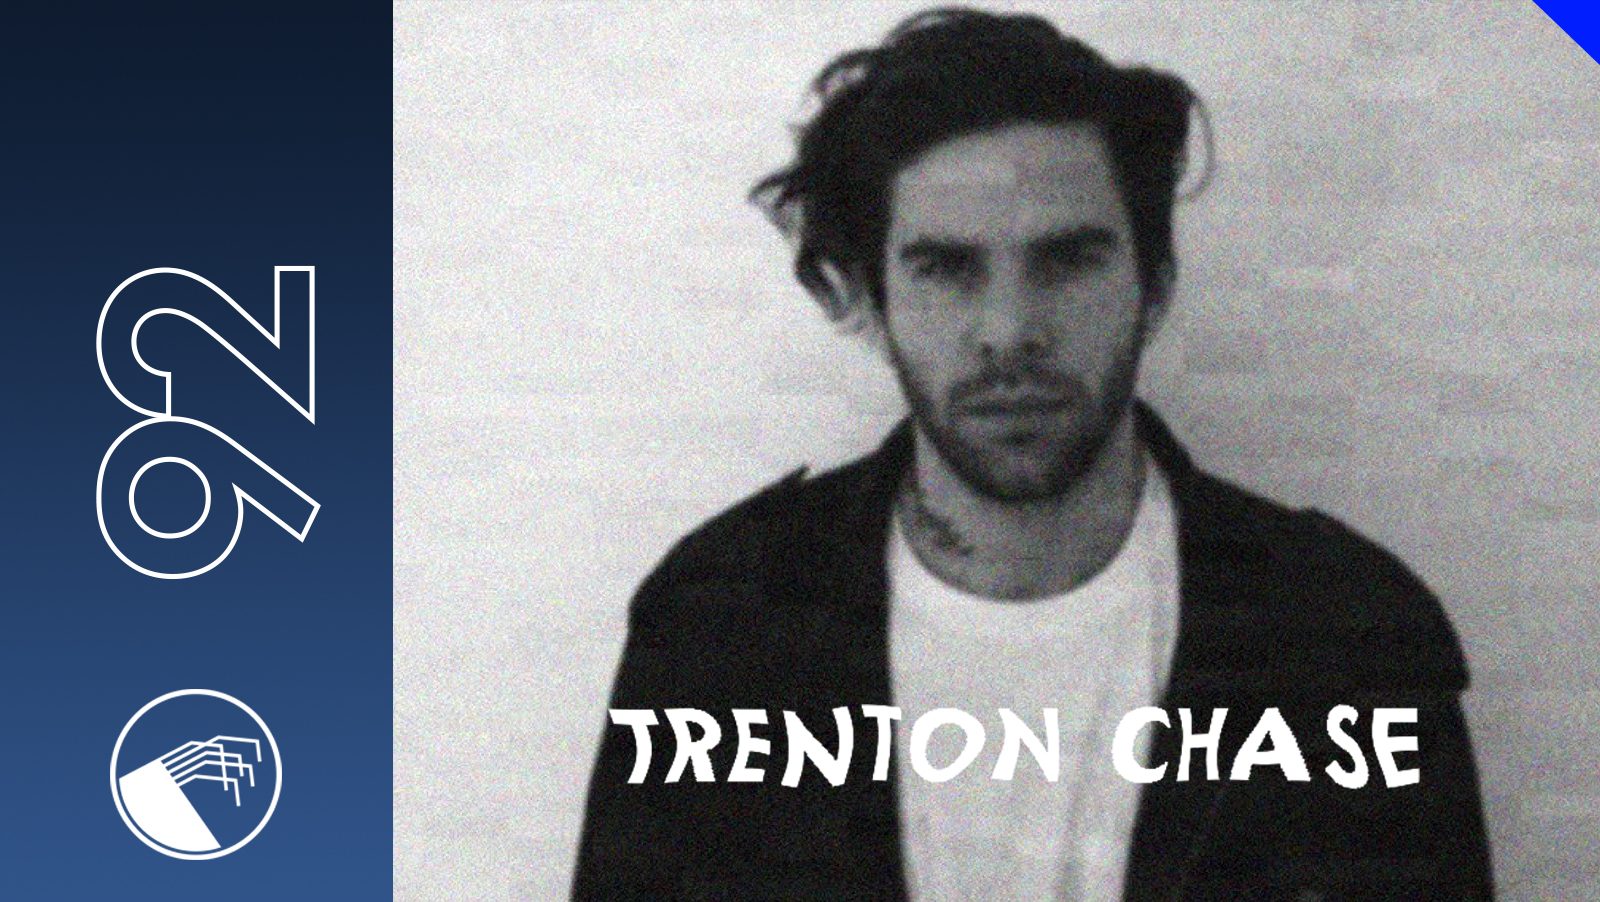 092 Trenton Chase